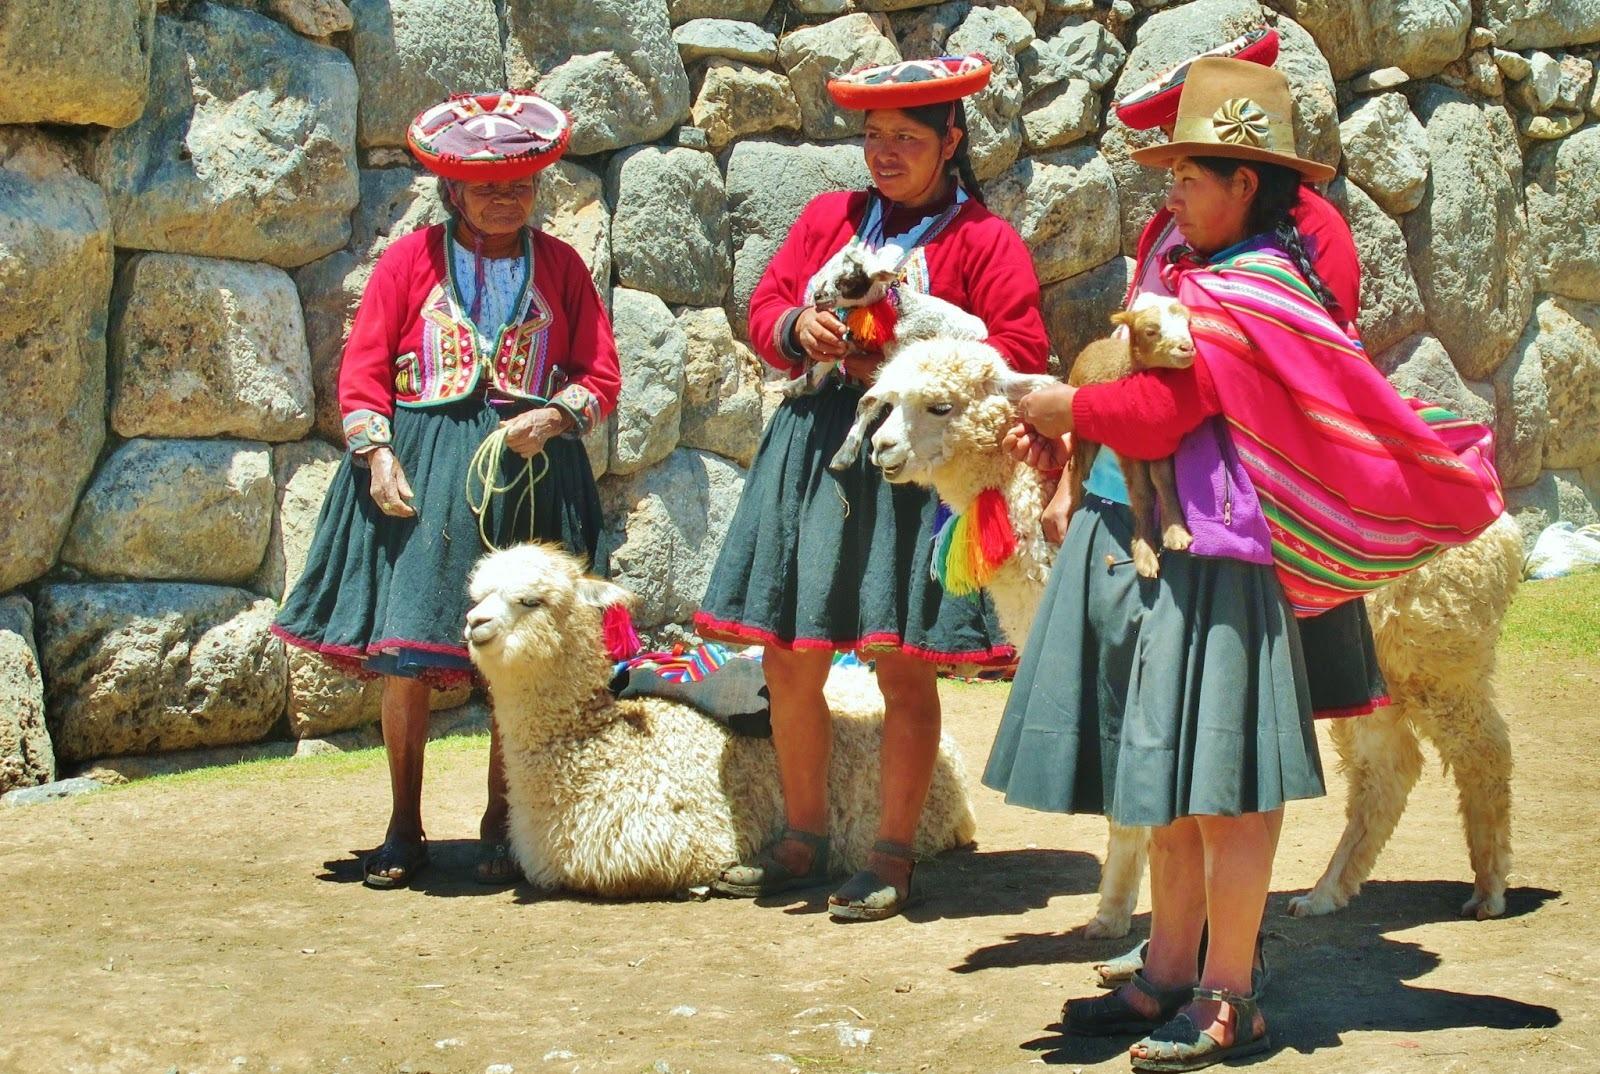 Curiosidades sobre Cusco e Machu Picchu 4